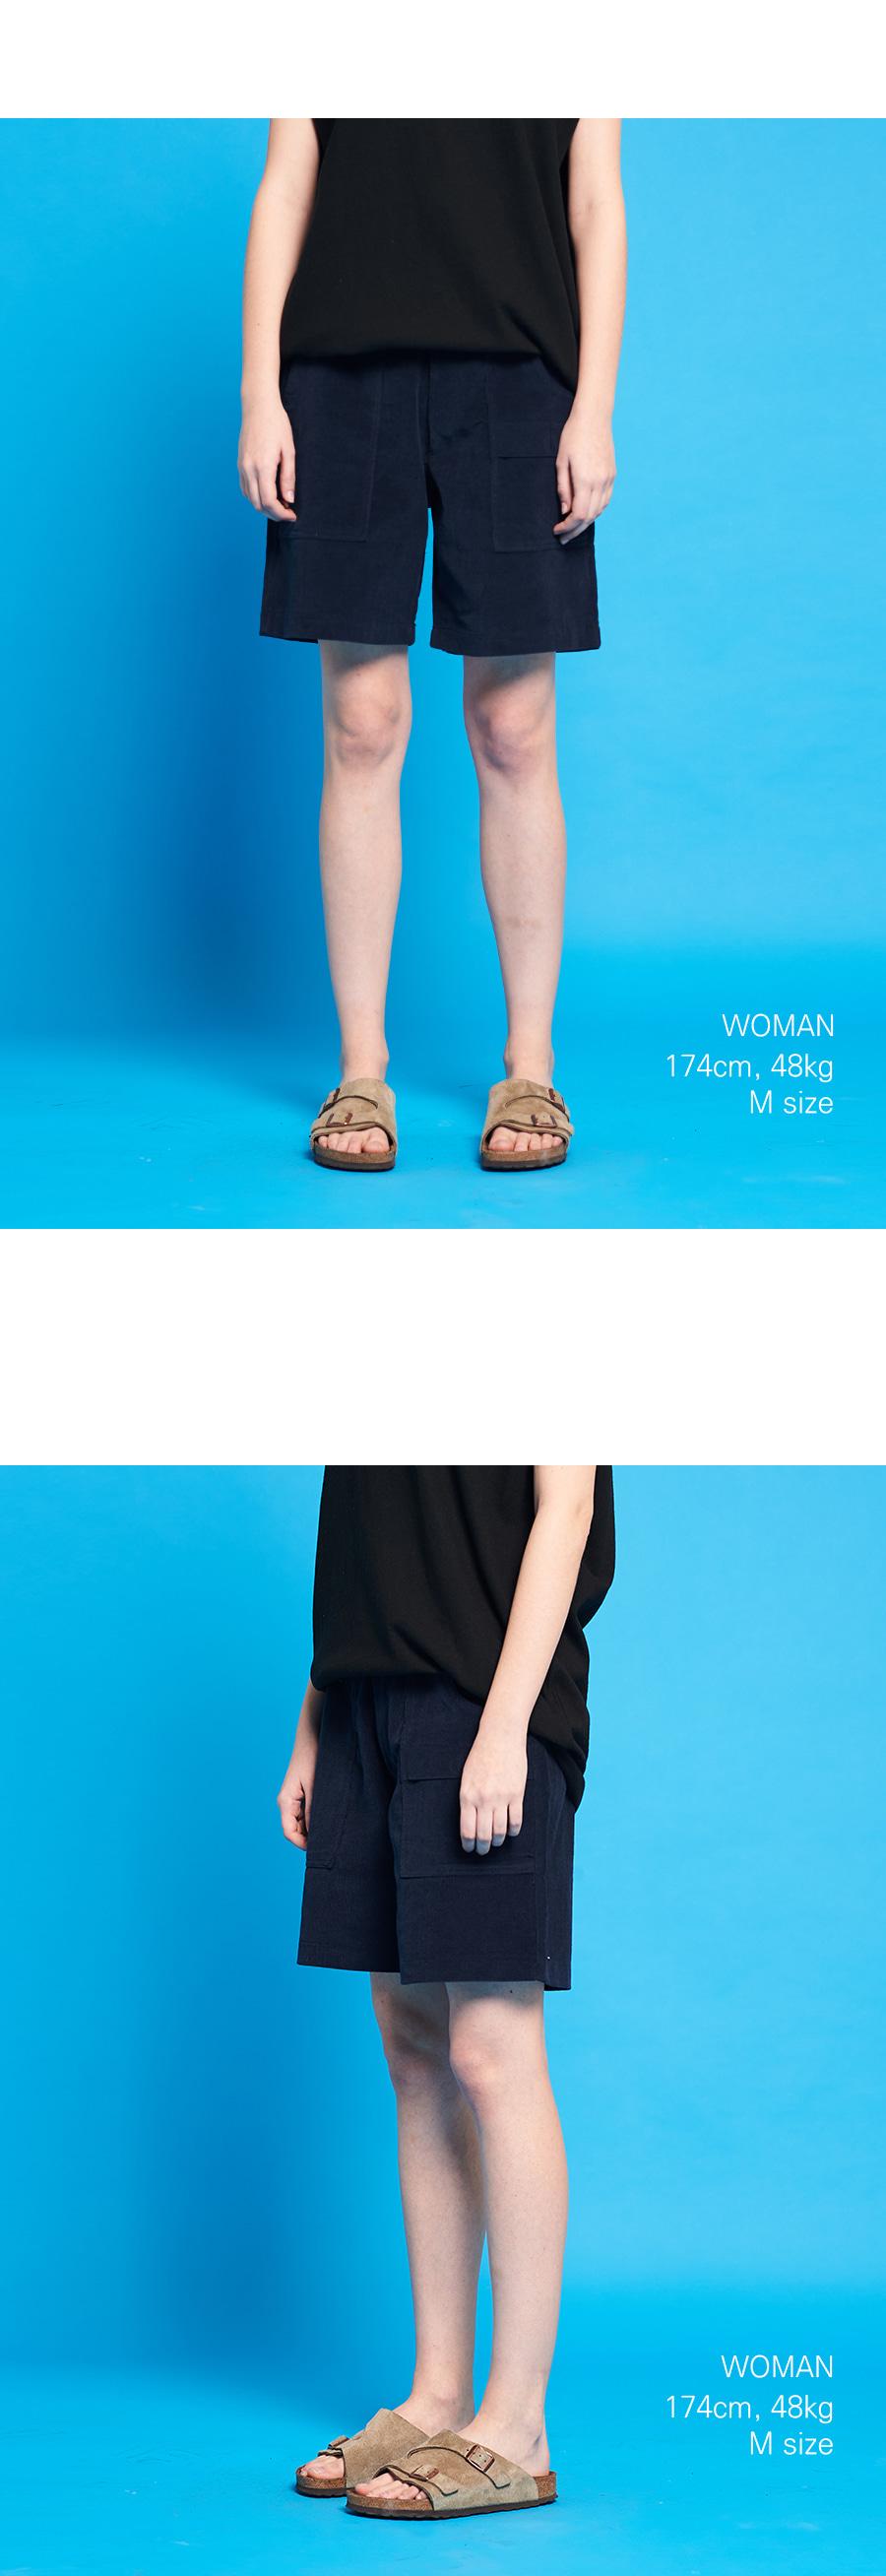 xtp003_nv_woman_1.jpg